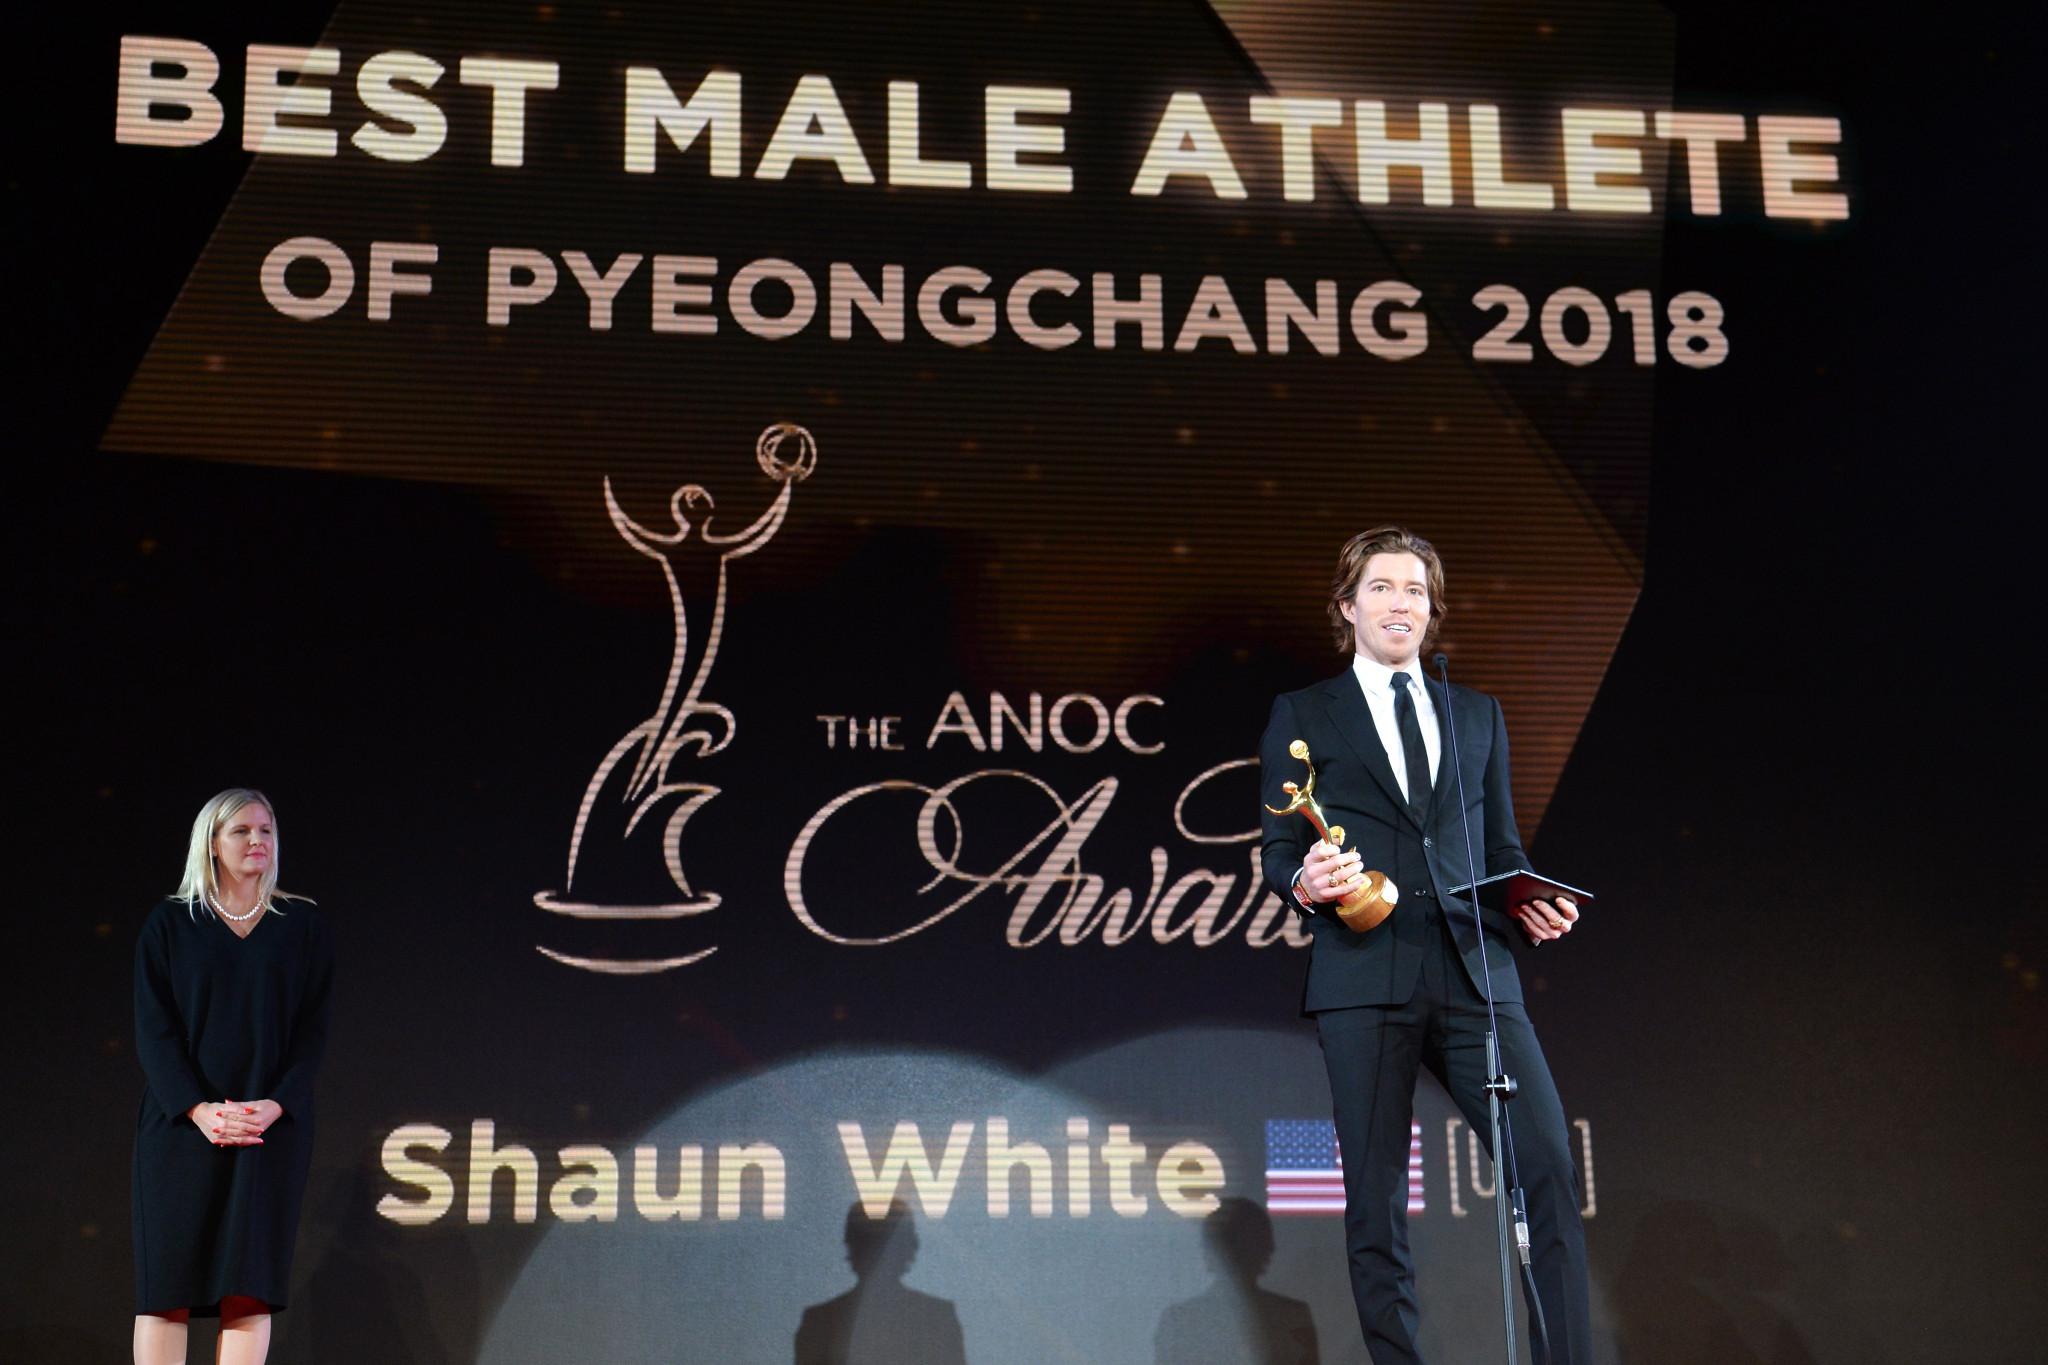 White and Fontana among Pyeongchang 2018 stars honoured as unified Korean ice hockey team win at 2018 ANOC Awards